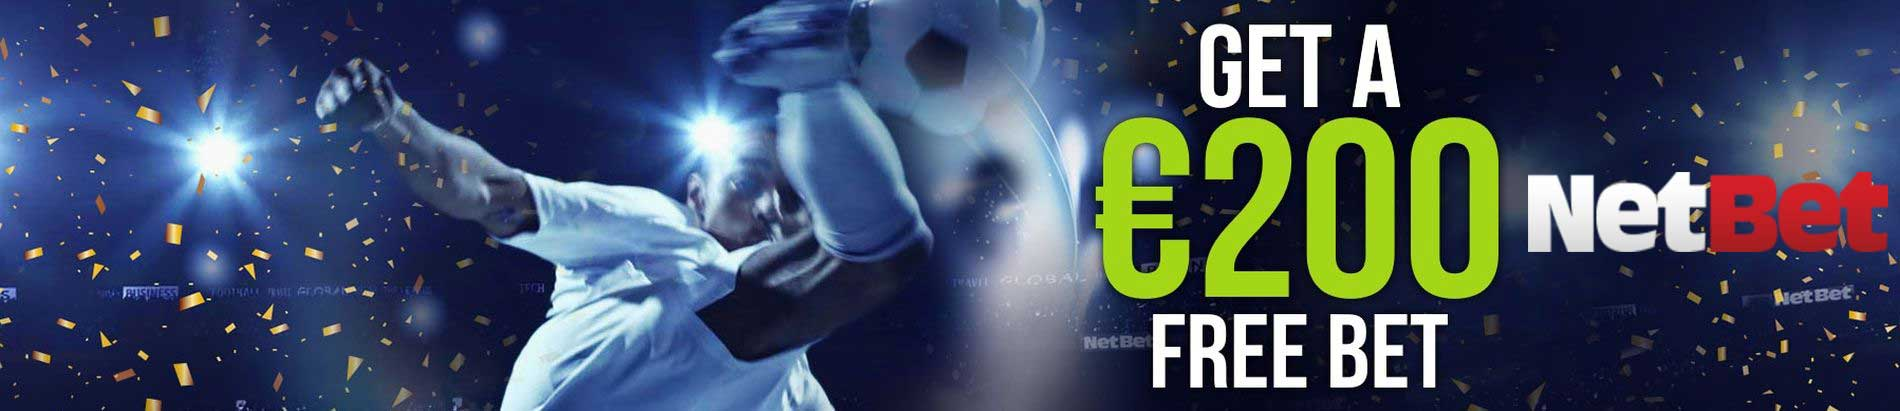 Netbet poker $ 1900 gratis casino Chile-499877